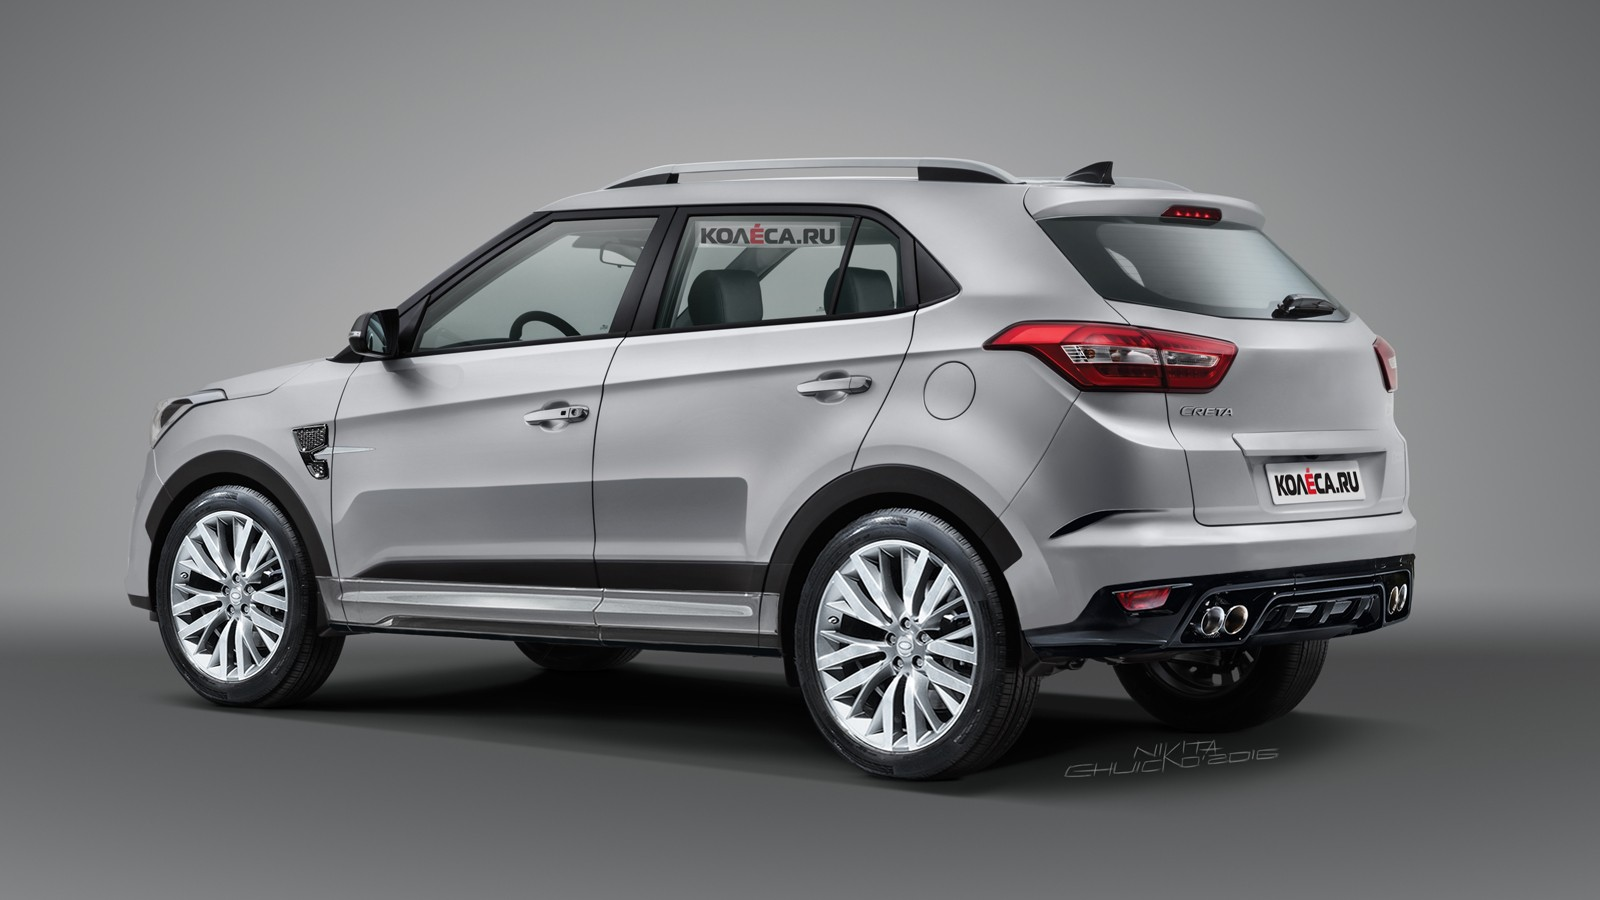 Hyundai Creta rear